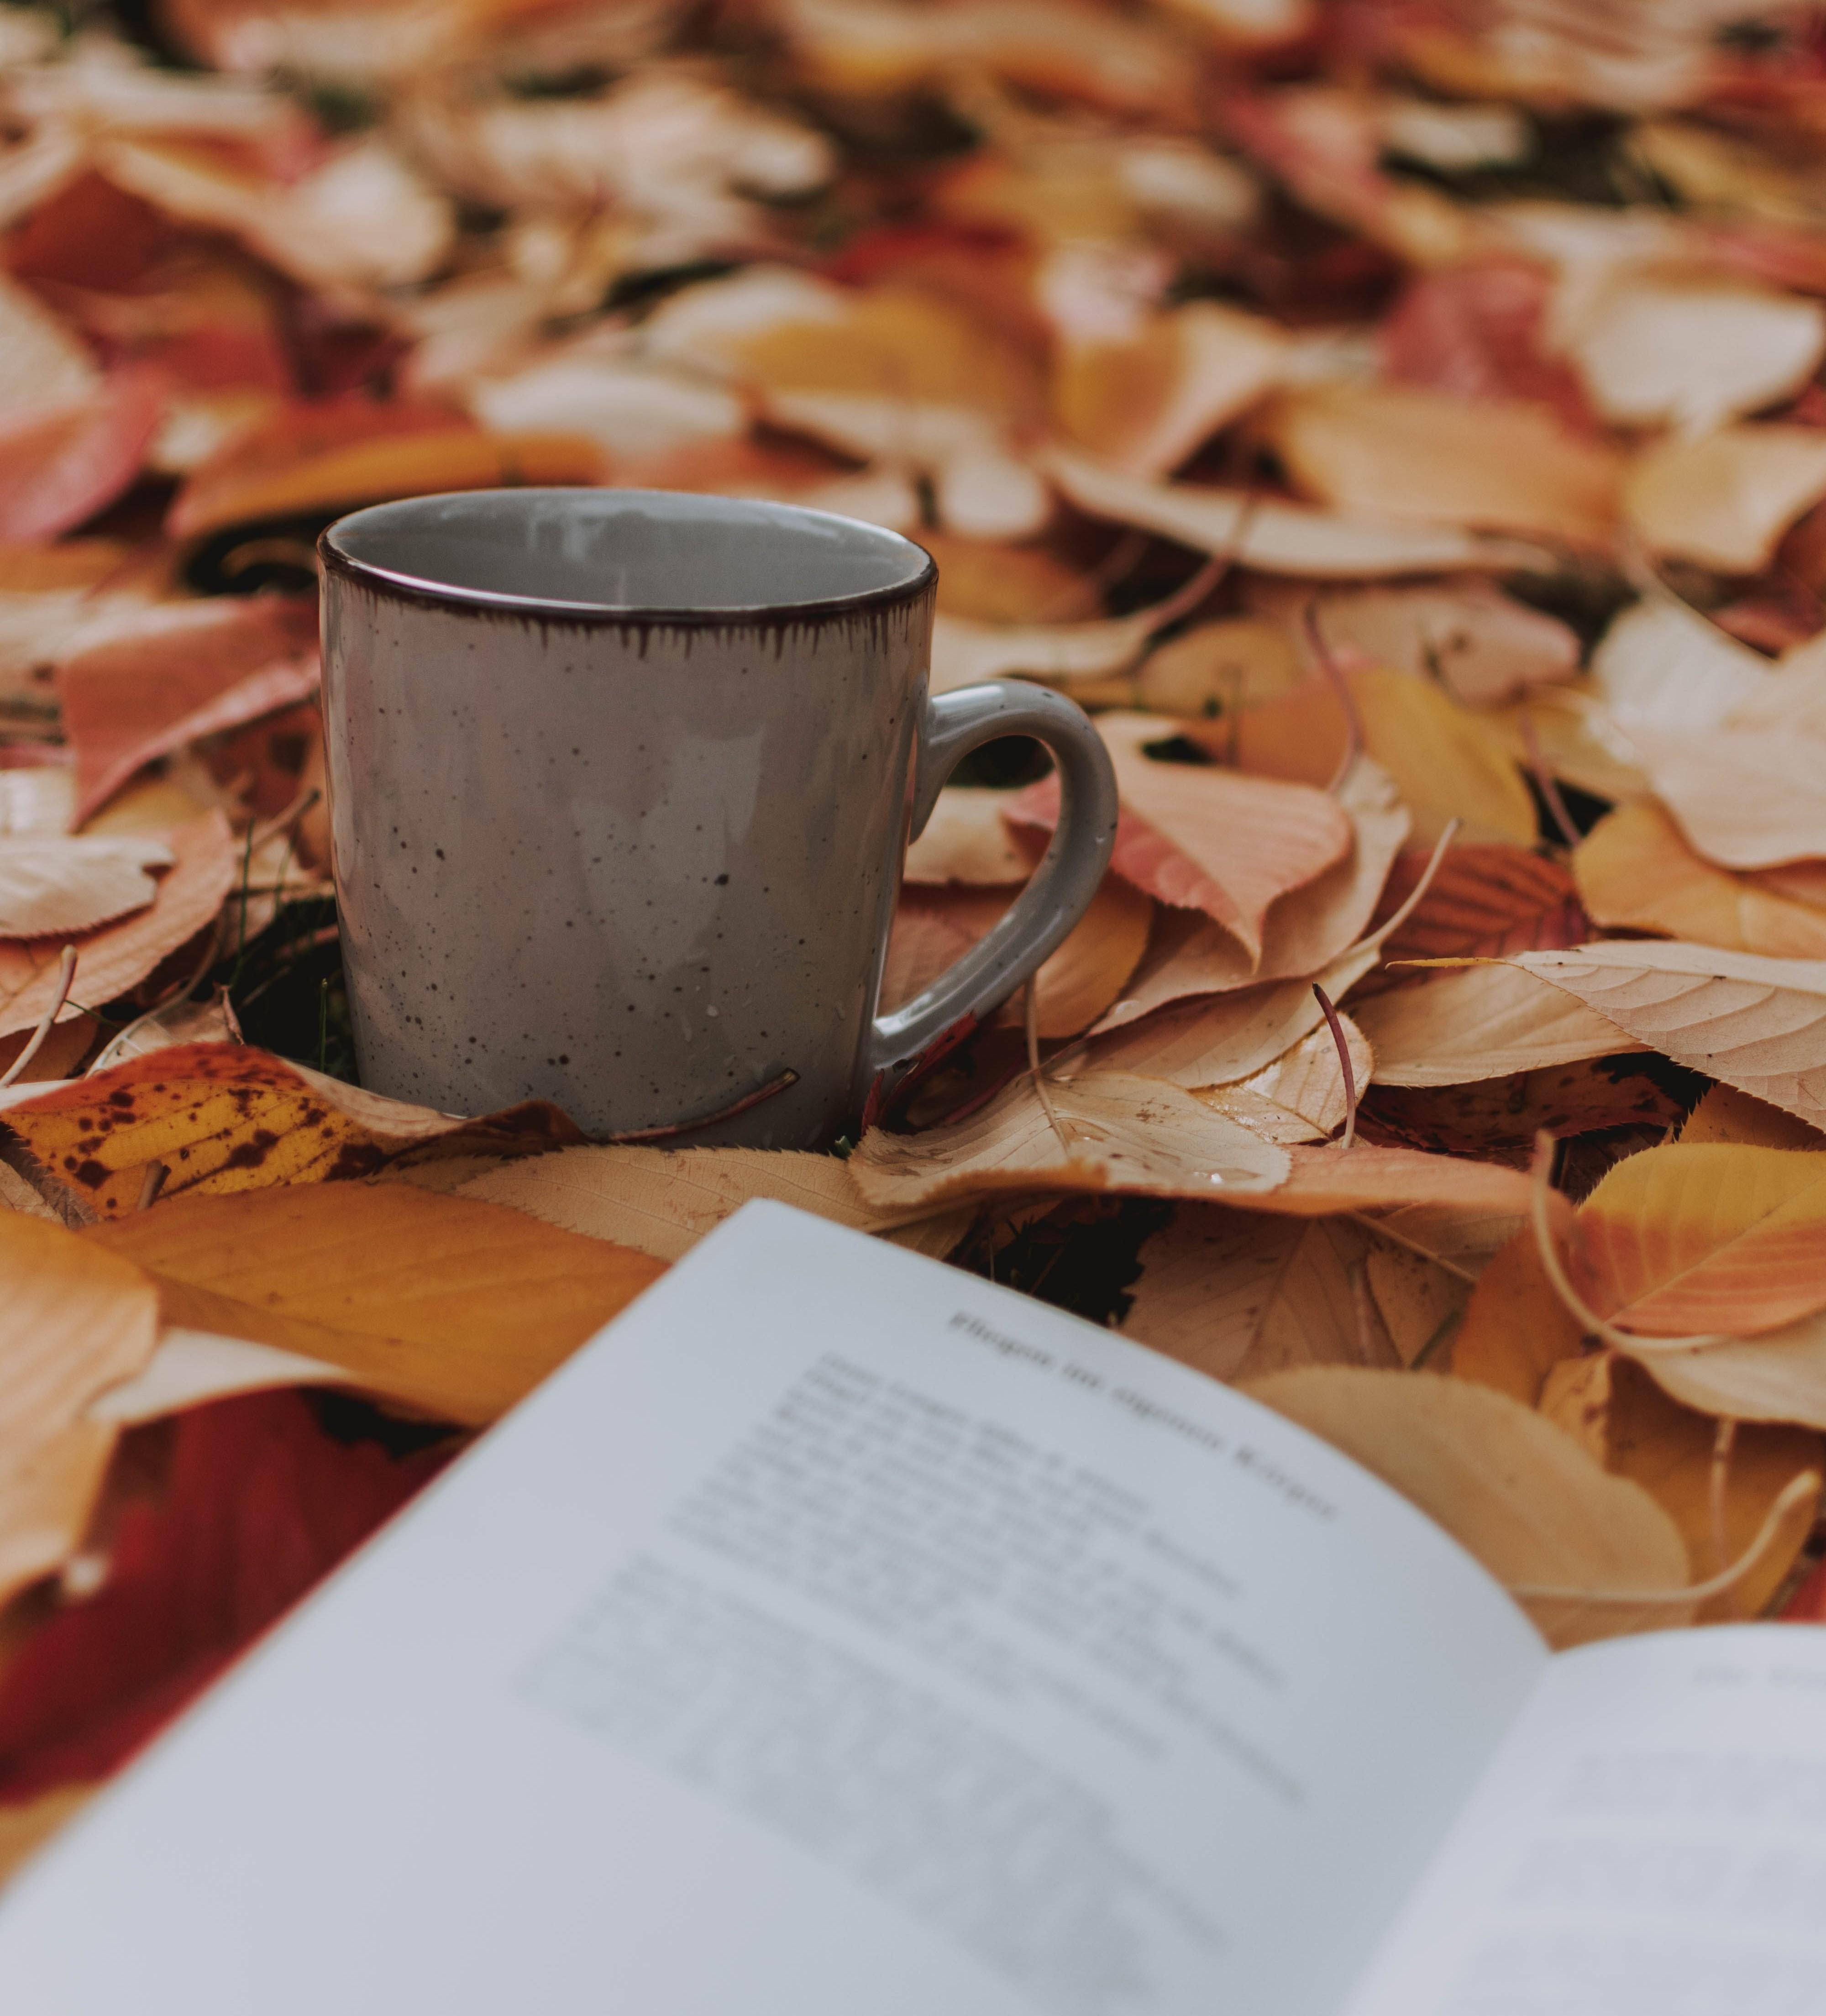 gray-ceramic-mug-on-dried-brown-leaves-3150551